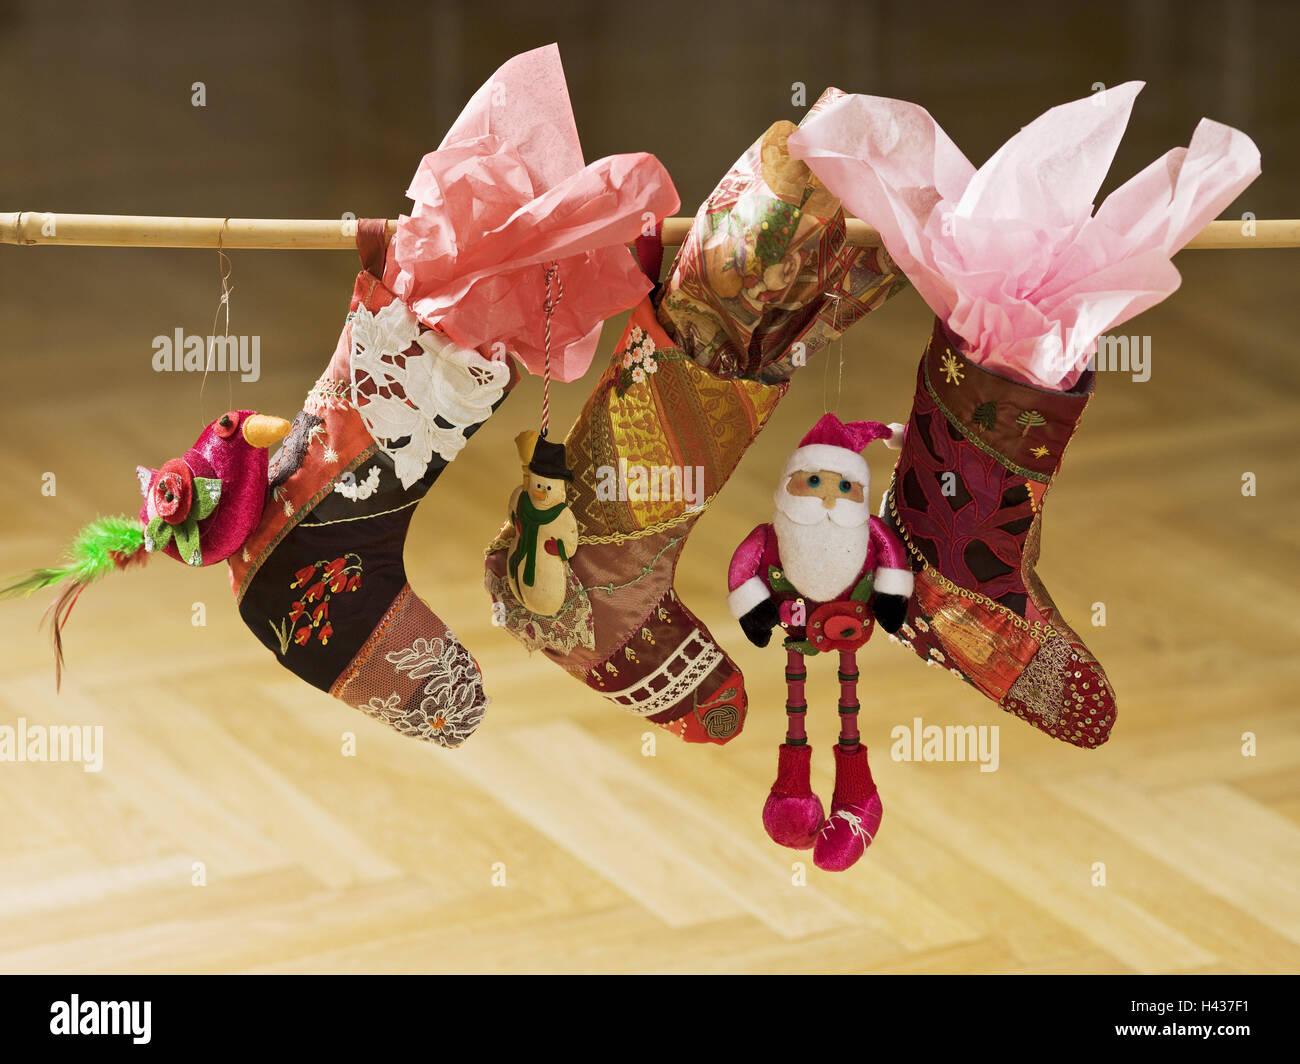 Weihnachtsdeko Xmas.Bamboo Stick Santa S Boot Hang Weihnachtsdeko Xmas Decoration